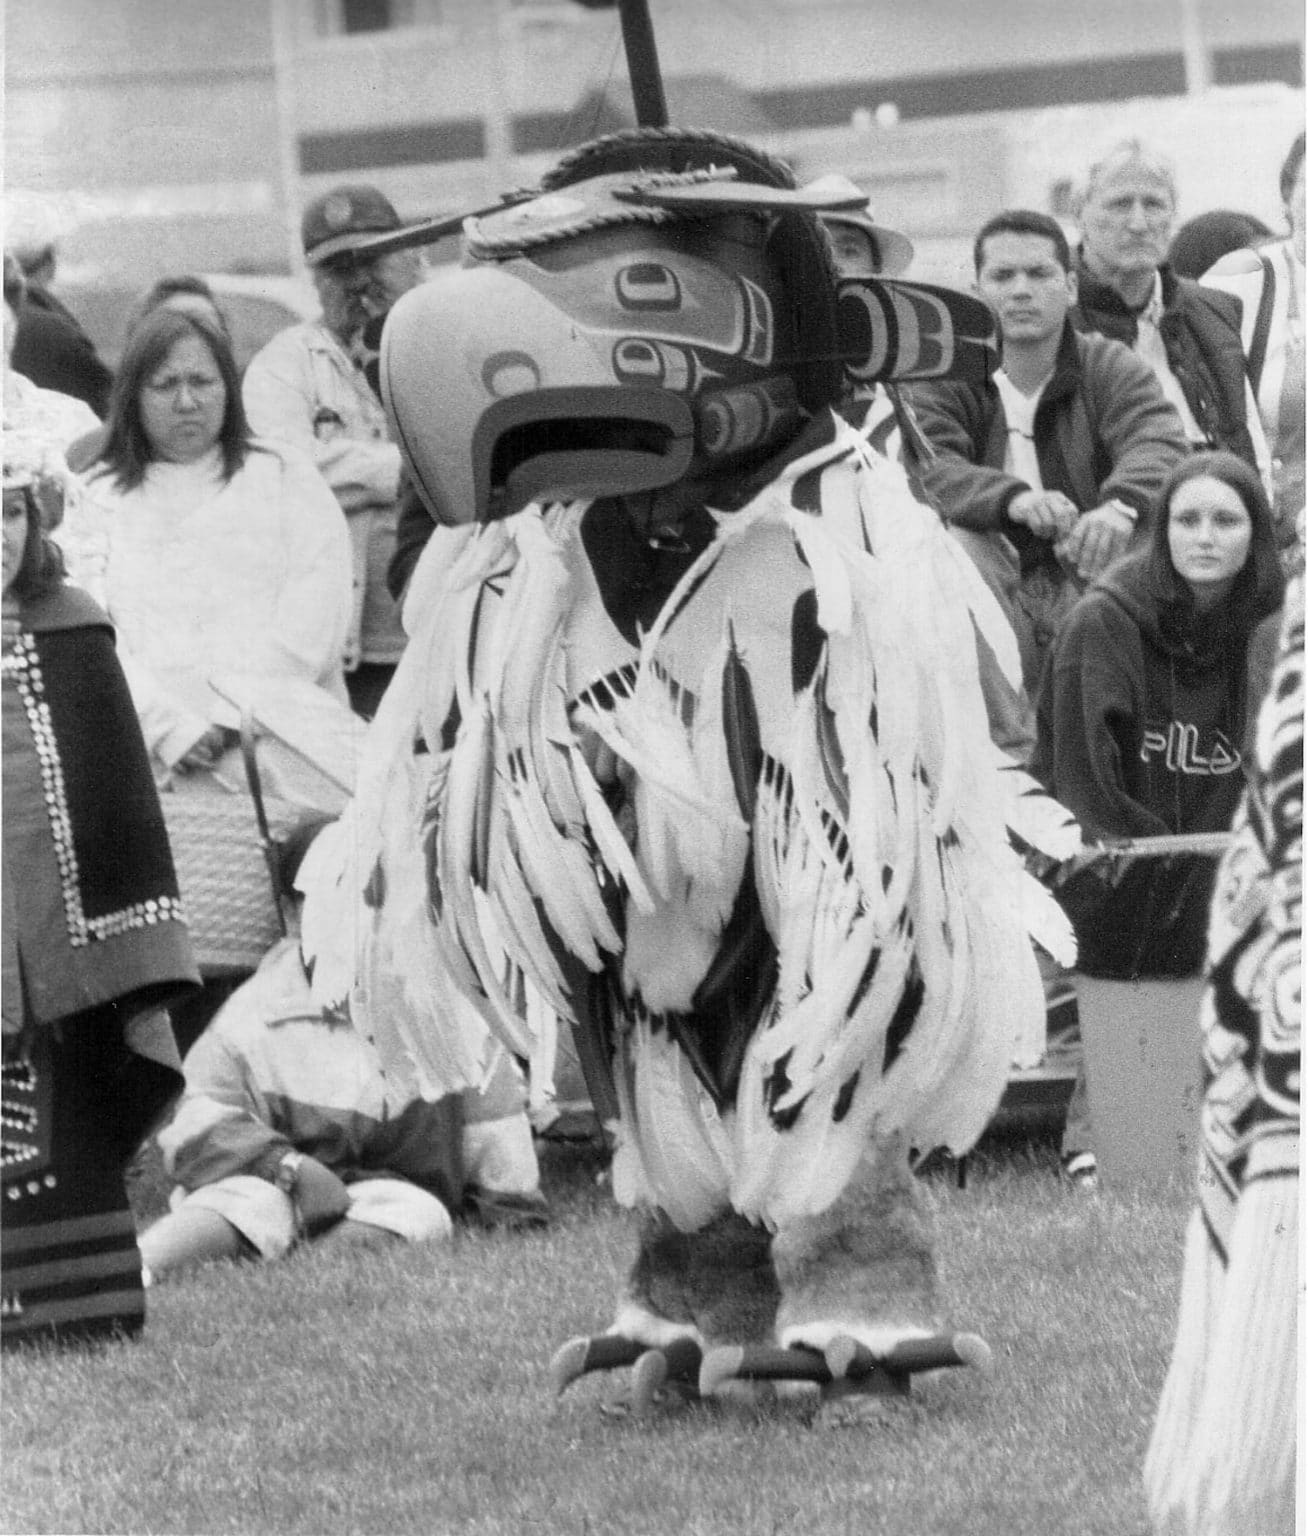 Thursday, Oct 15, 2009:  The British Columbia Aboriginal Achievement Award presented to Calvin Hunt by Premier Gordon Campbell. Photo by Kim Stallknecht